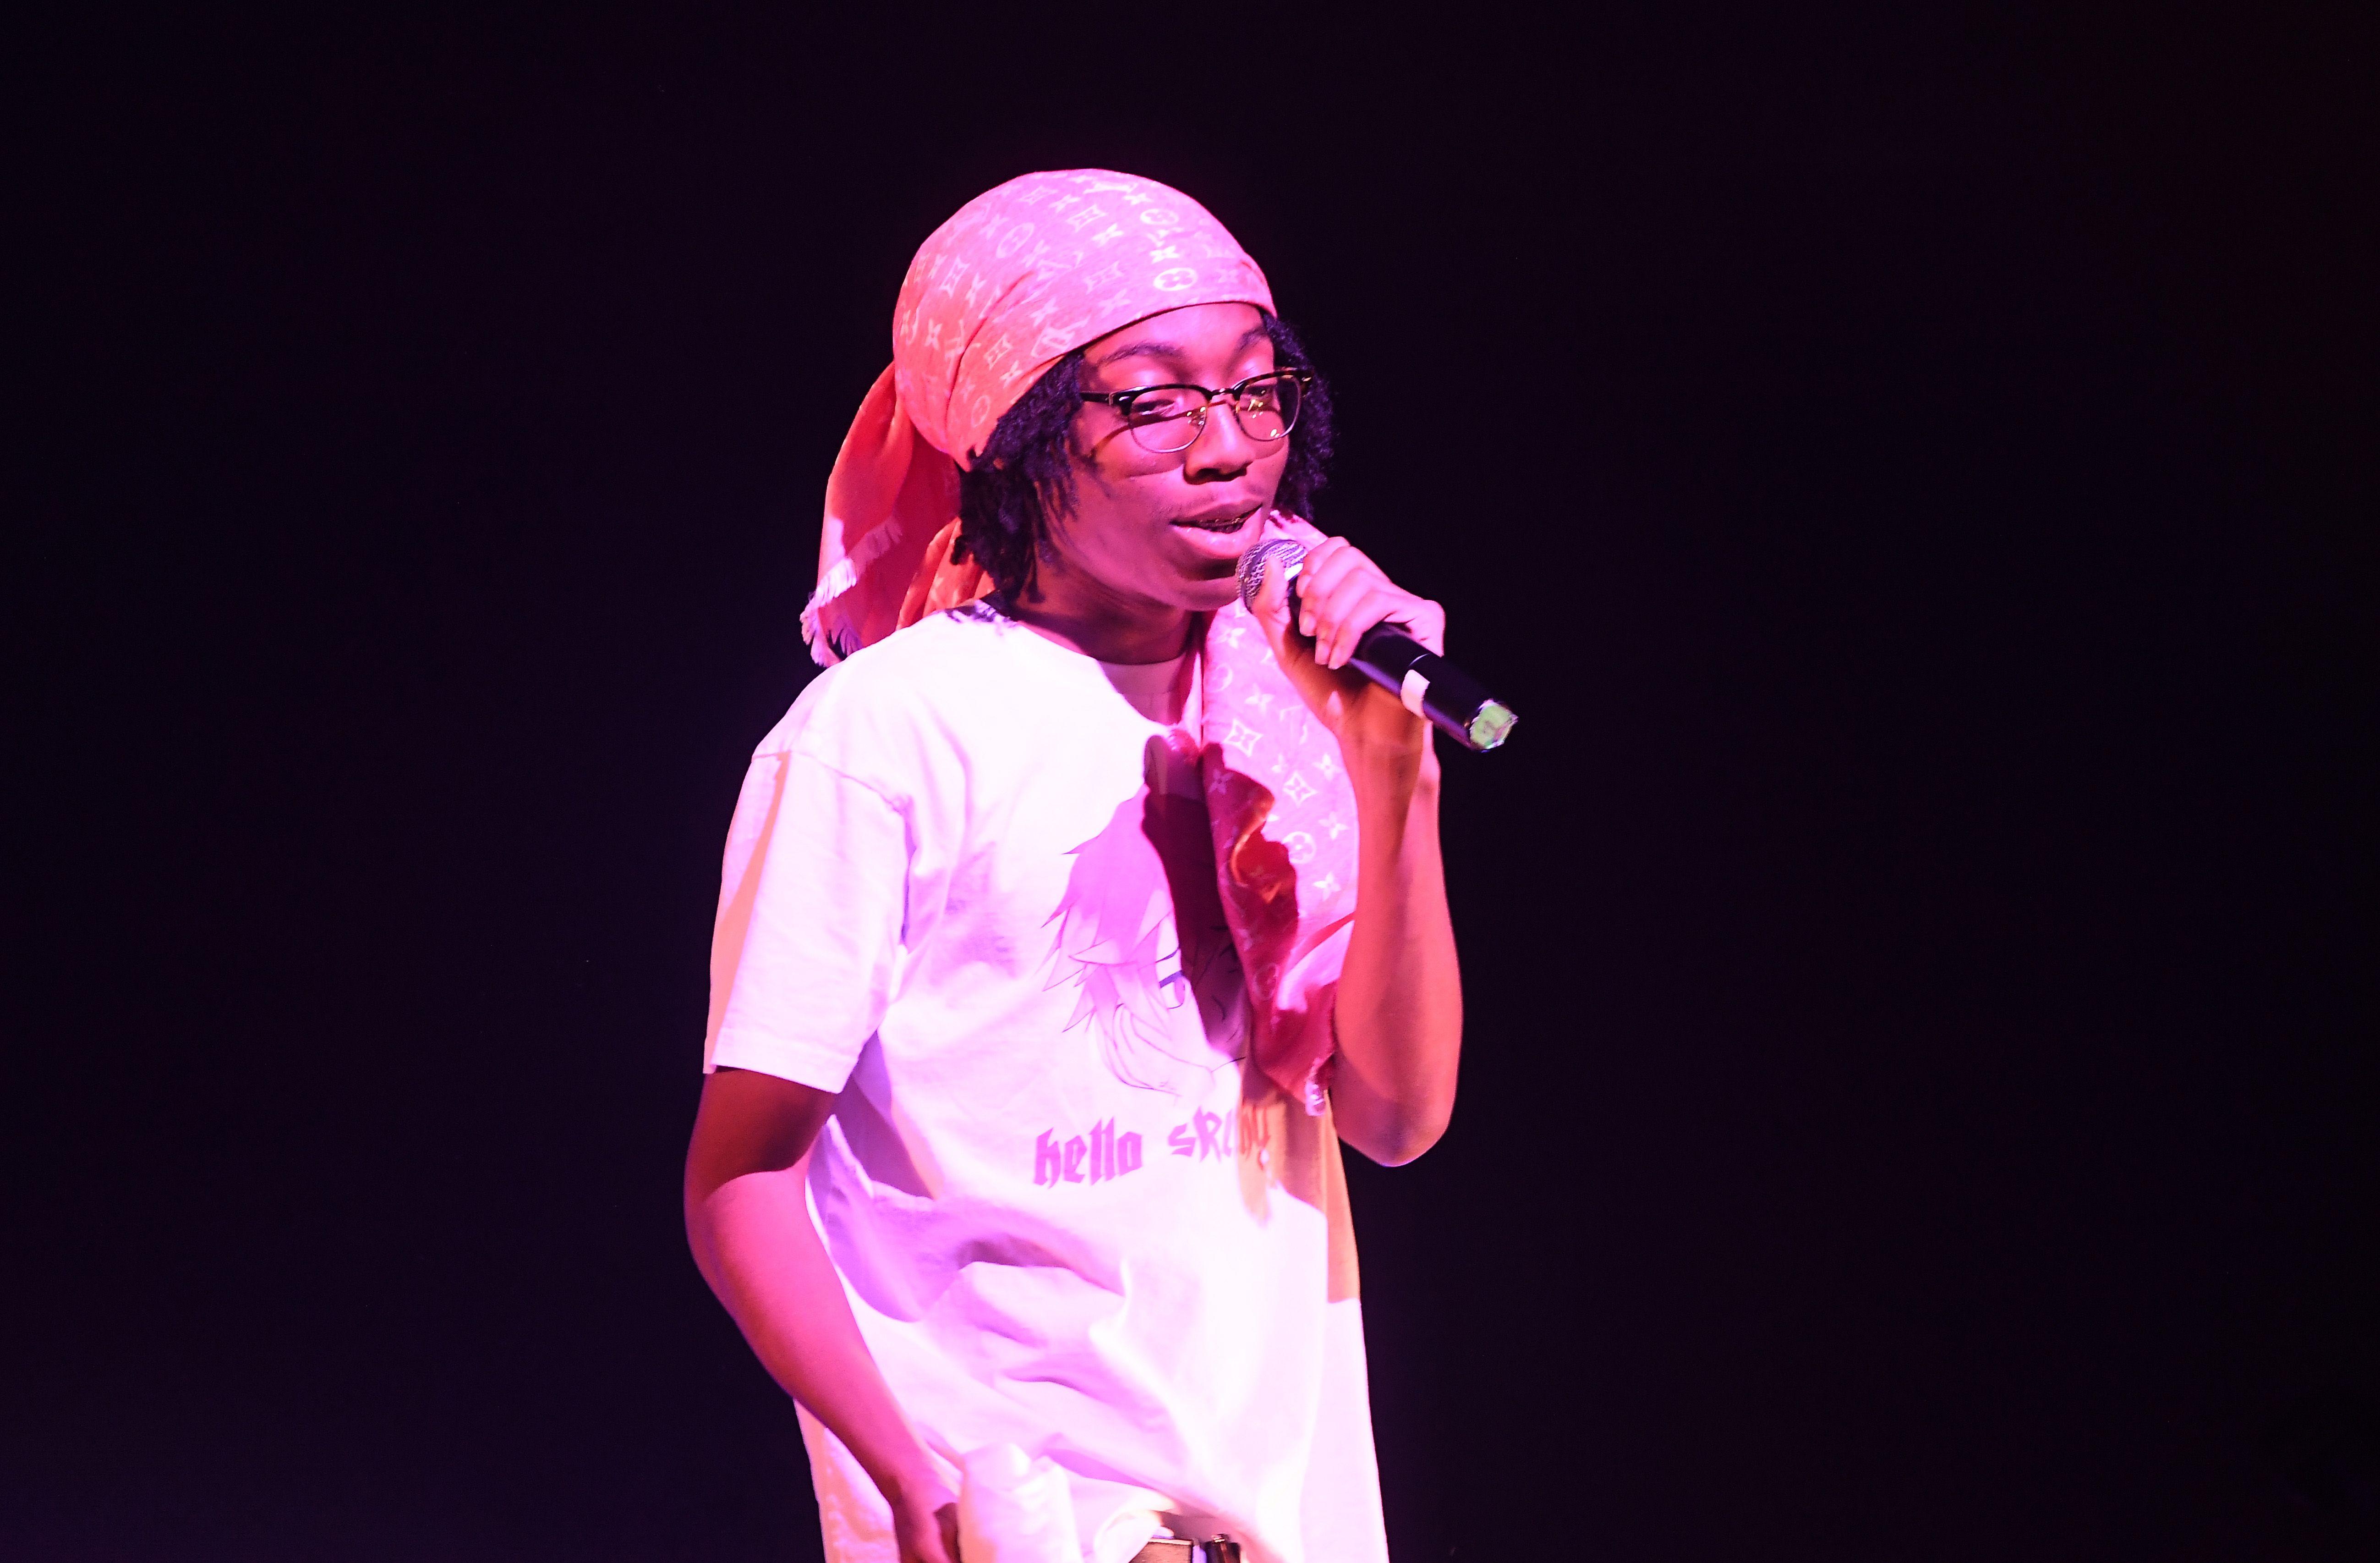 Rapper Lil Tecca addresses death rumors